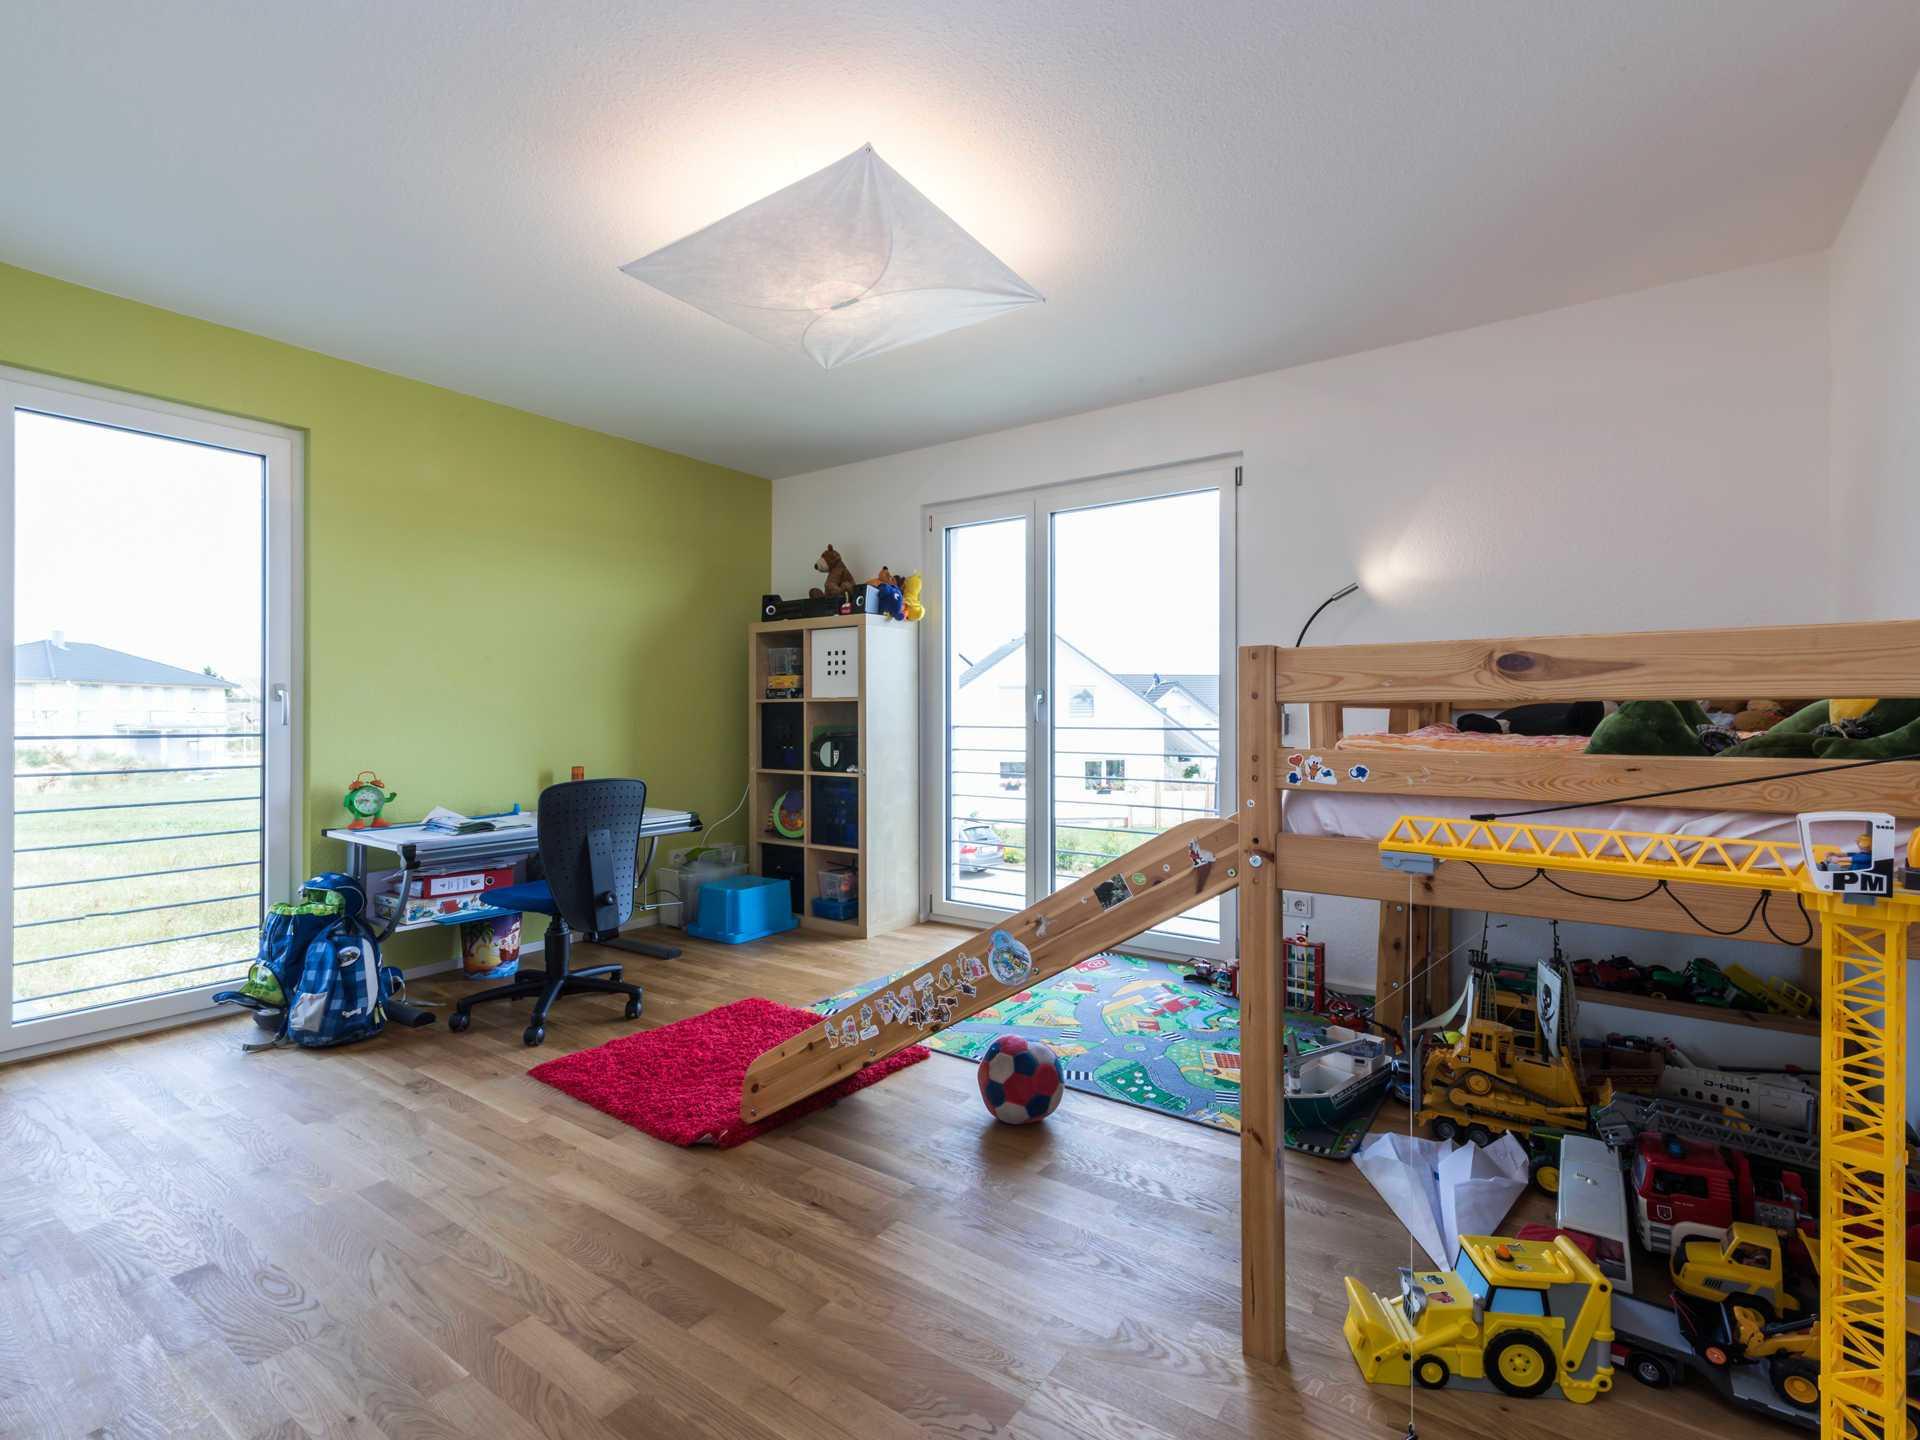 bauhausstil empfingen kitzlingerhaus. Black Bedroom Furniture Sets. Home Design Ideas